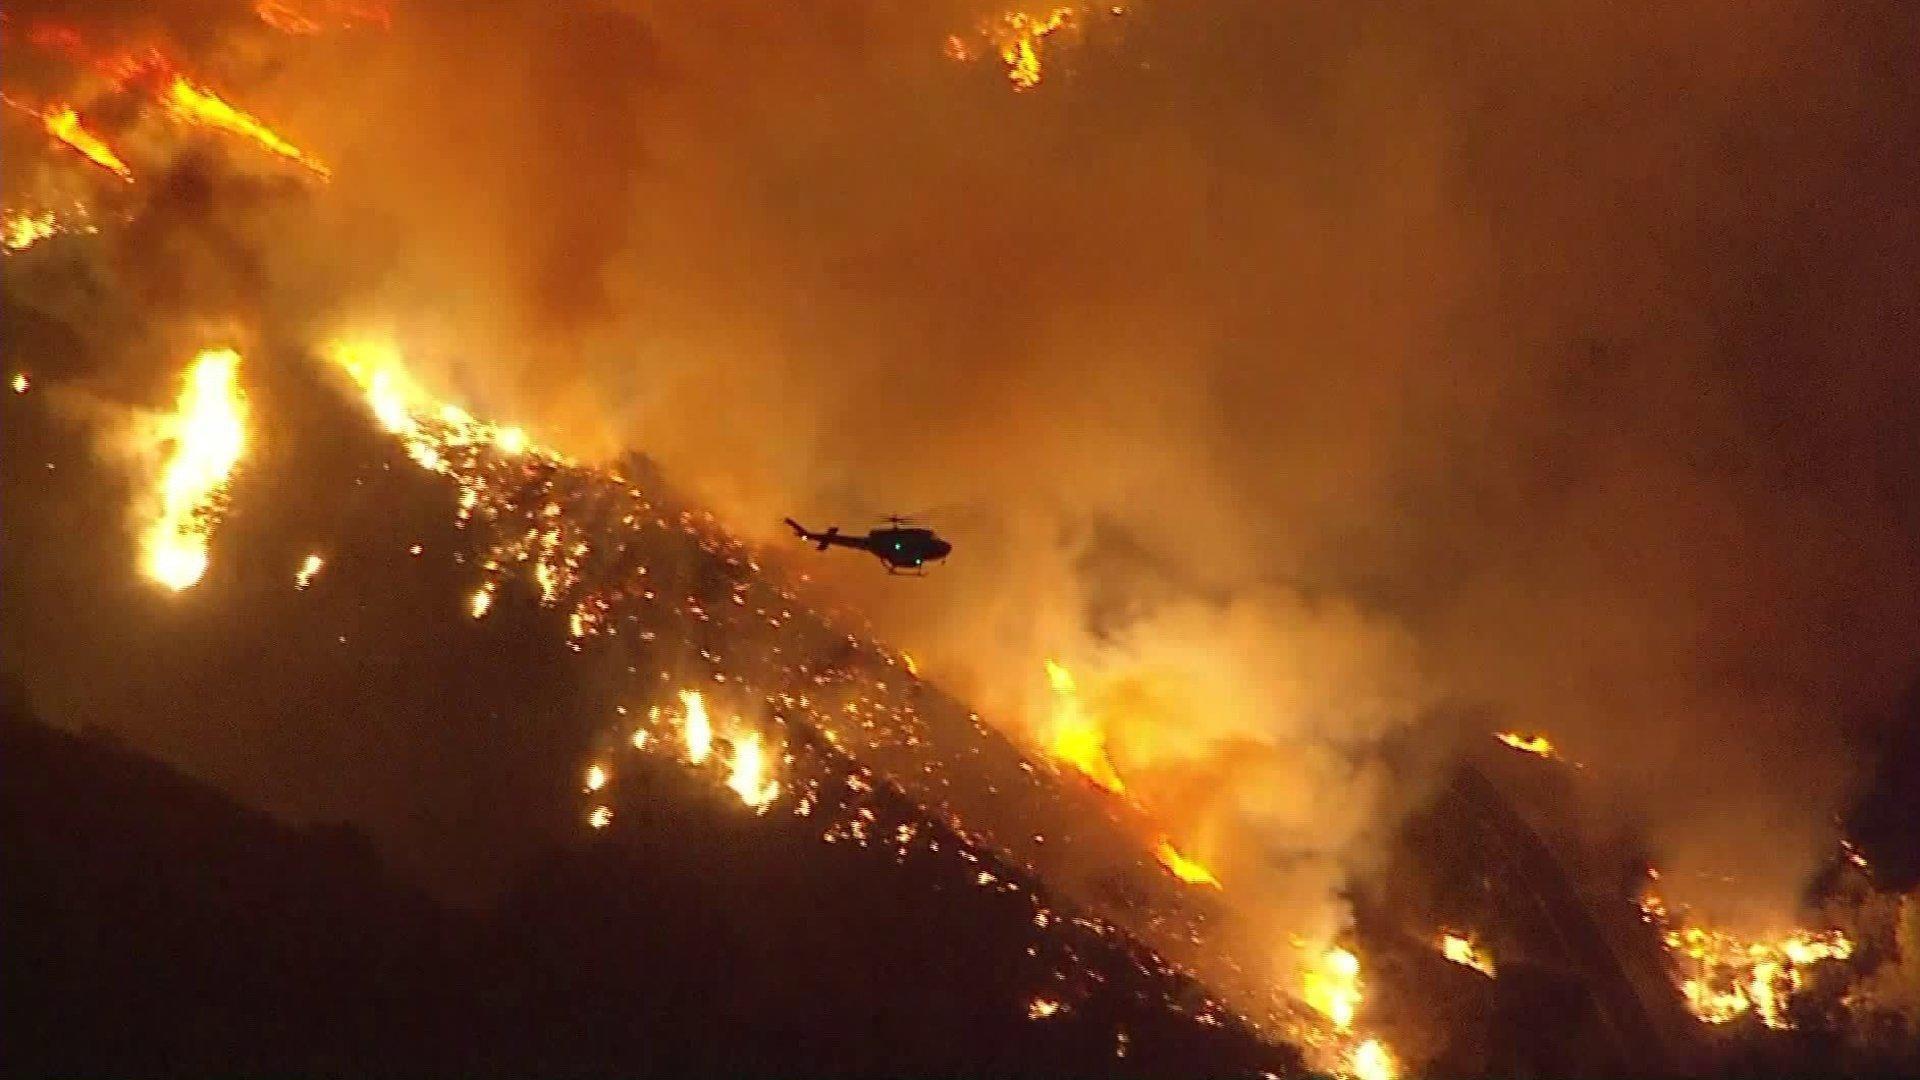 Thousands Flee Wildfire In Ventura County North Of Los Angeles Ventura County Ventura Los Angeles